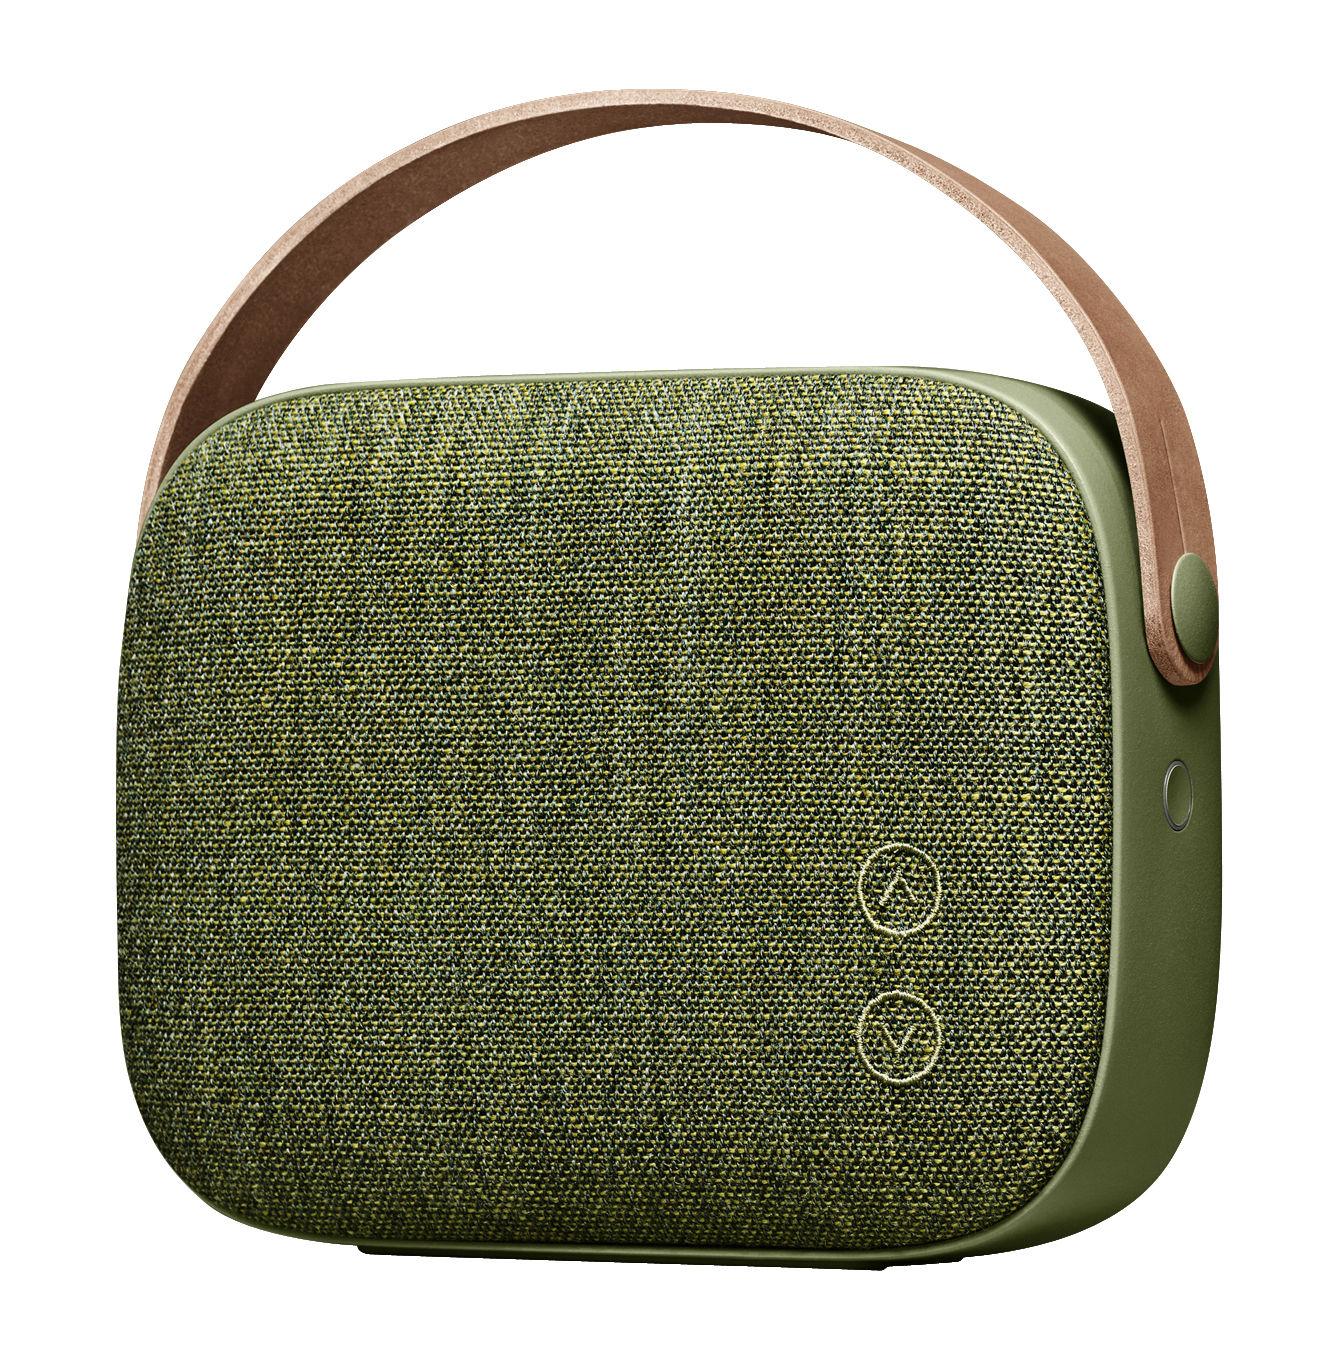 Vatertag - Moderne - Helsinki Bluetooth-Lautsprecher / kabellos - mit Stoffbezug und Ledergriff - Vifa - Weidengrün - Aluminium, Kvadrat-Gewebe, Leder